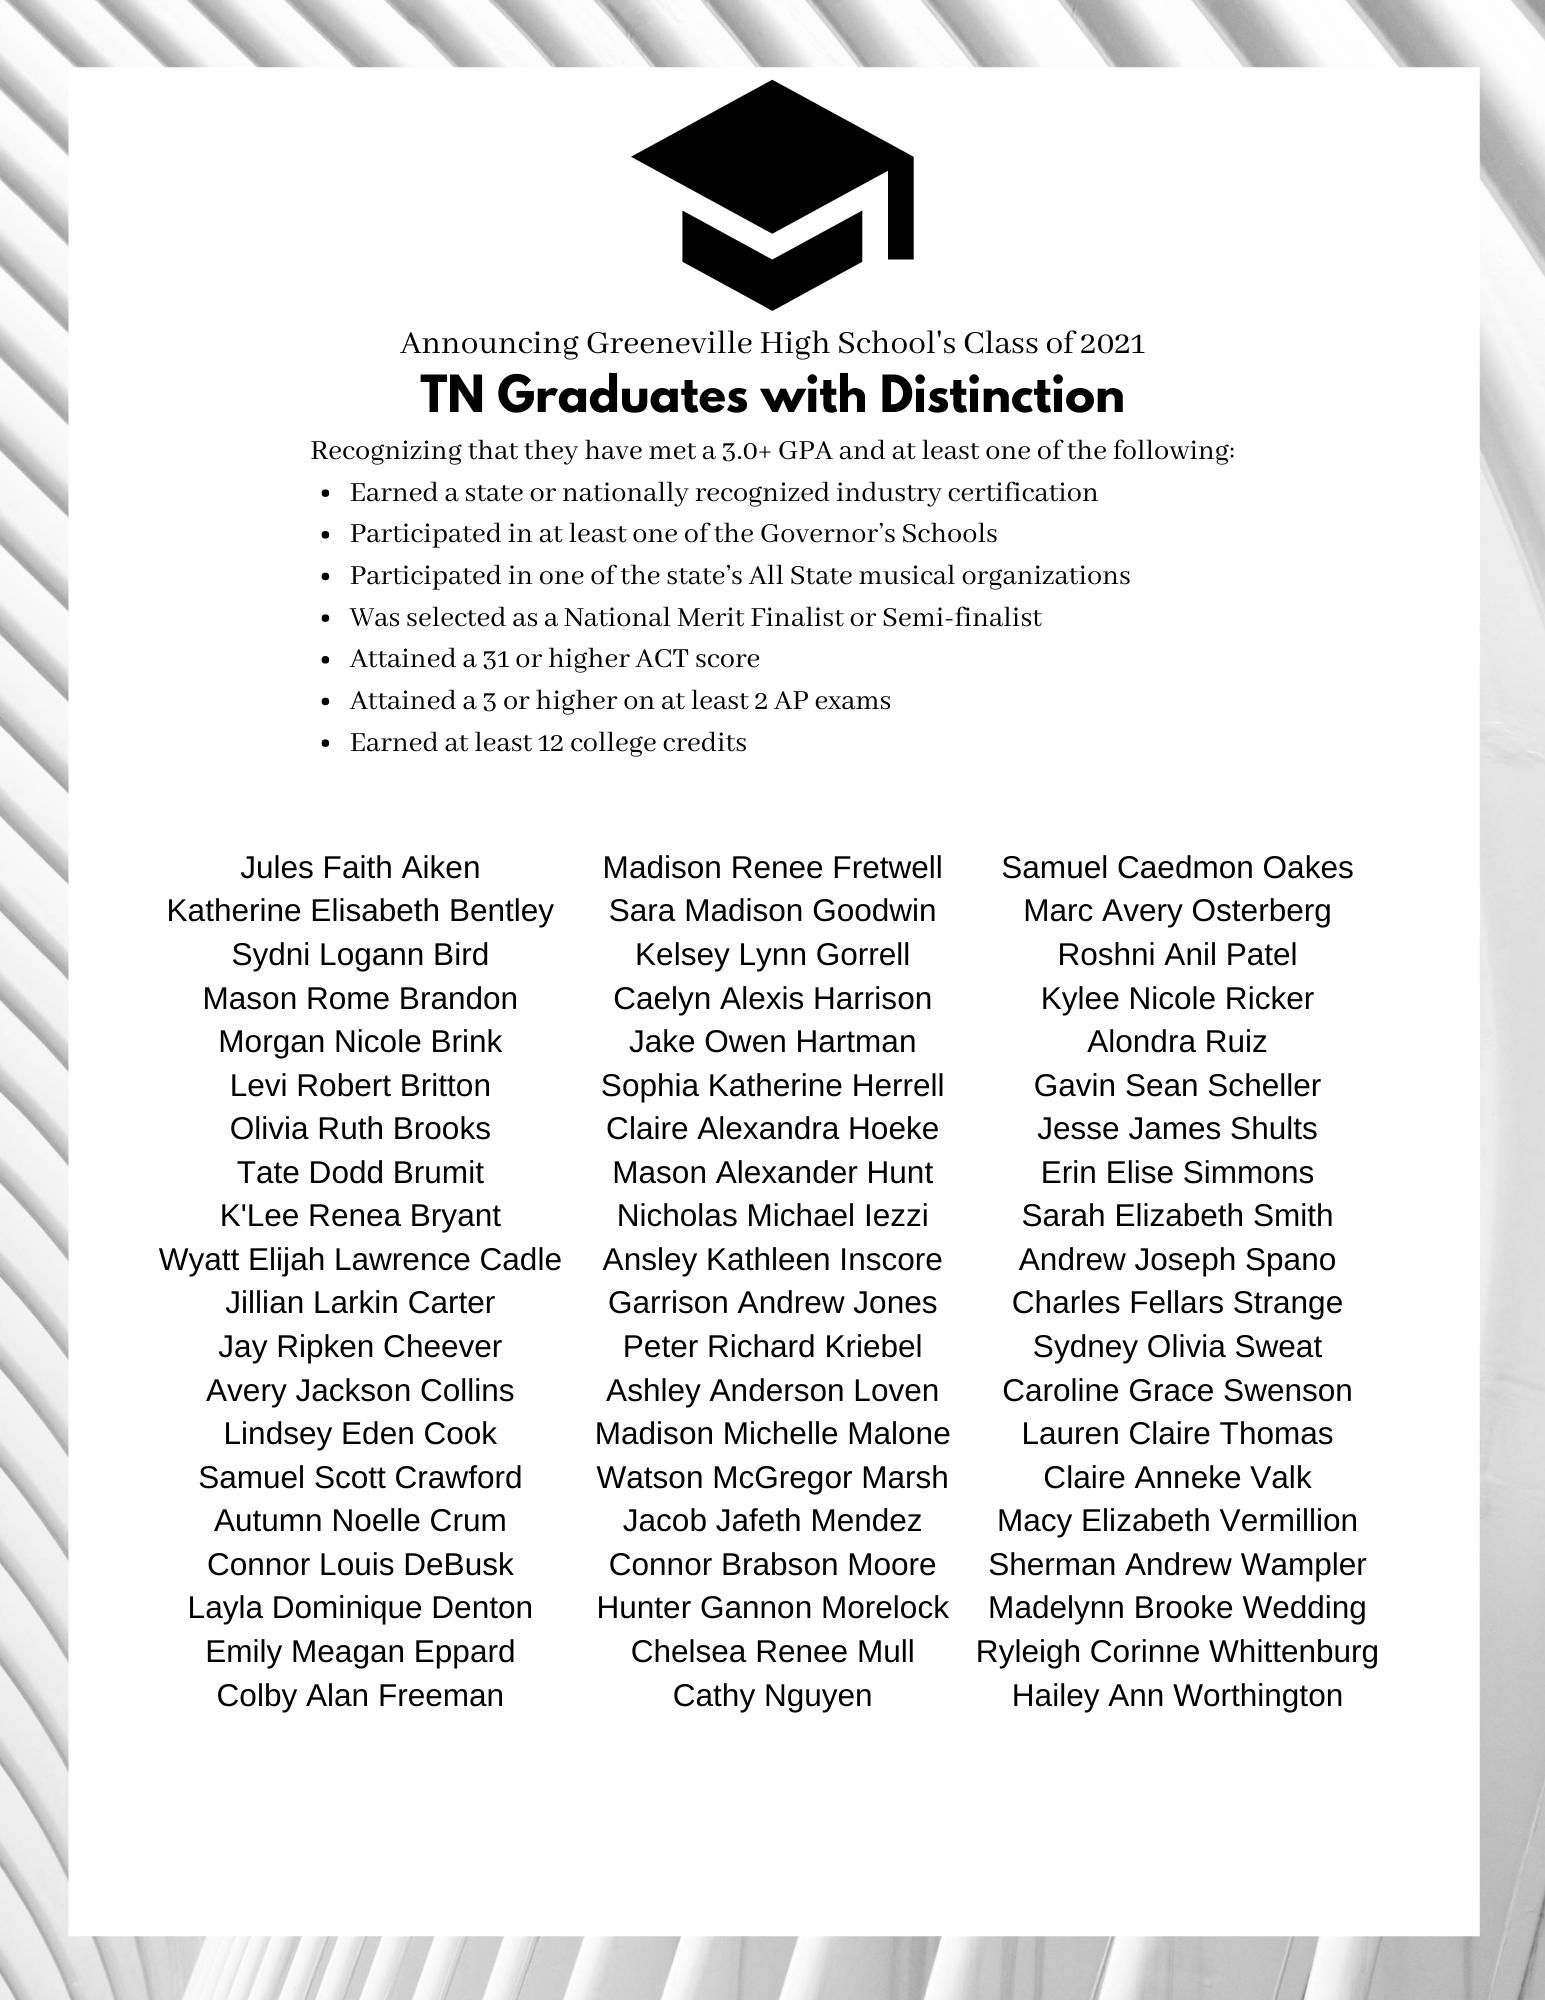 Class of 2021 TN Graduate with Distinction